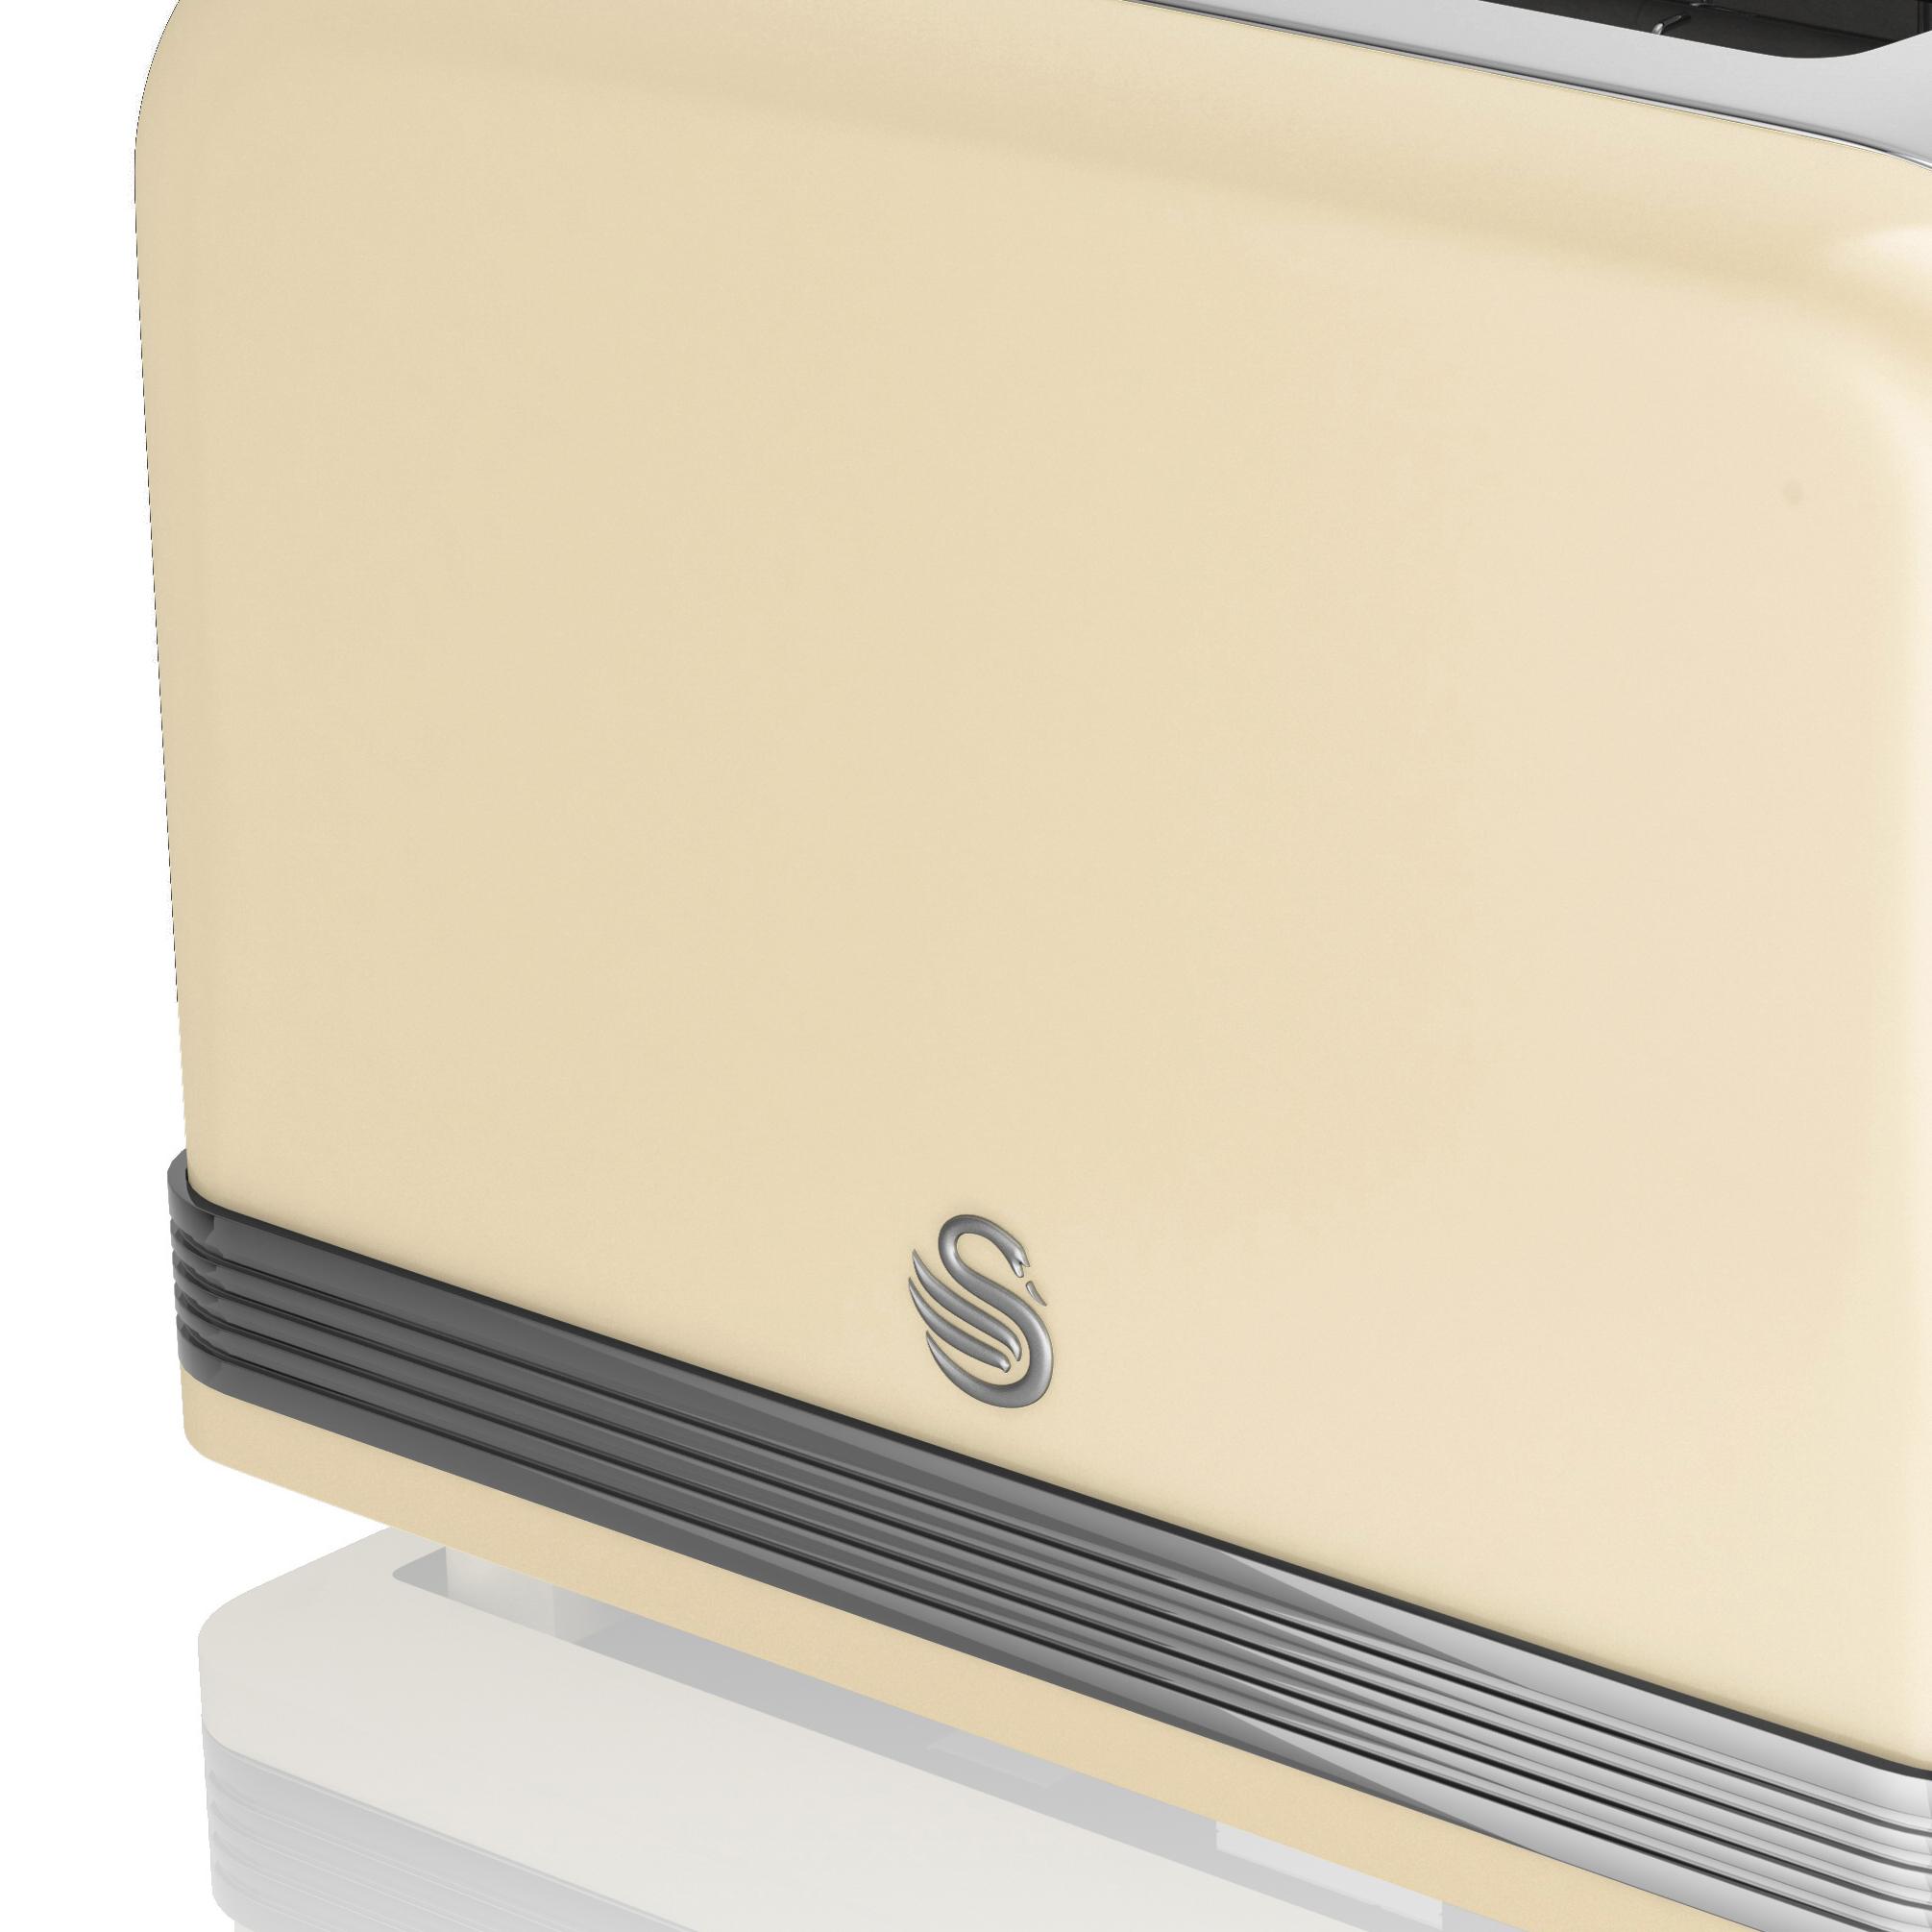 thumbnail 34 - Swan Retro 1.5L Jug Kettle 3KW, 2 Slice Toaster 815W & 20L Digital Microwave Set